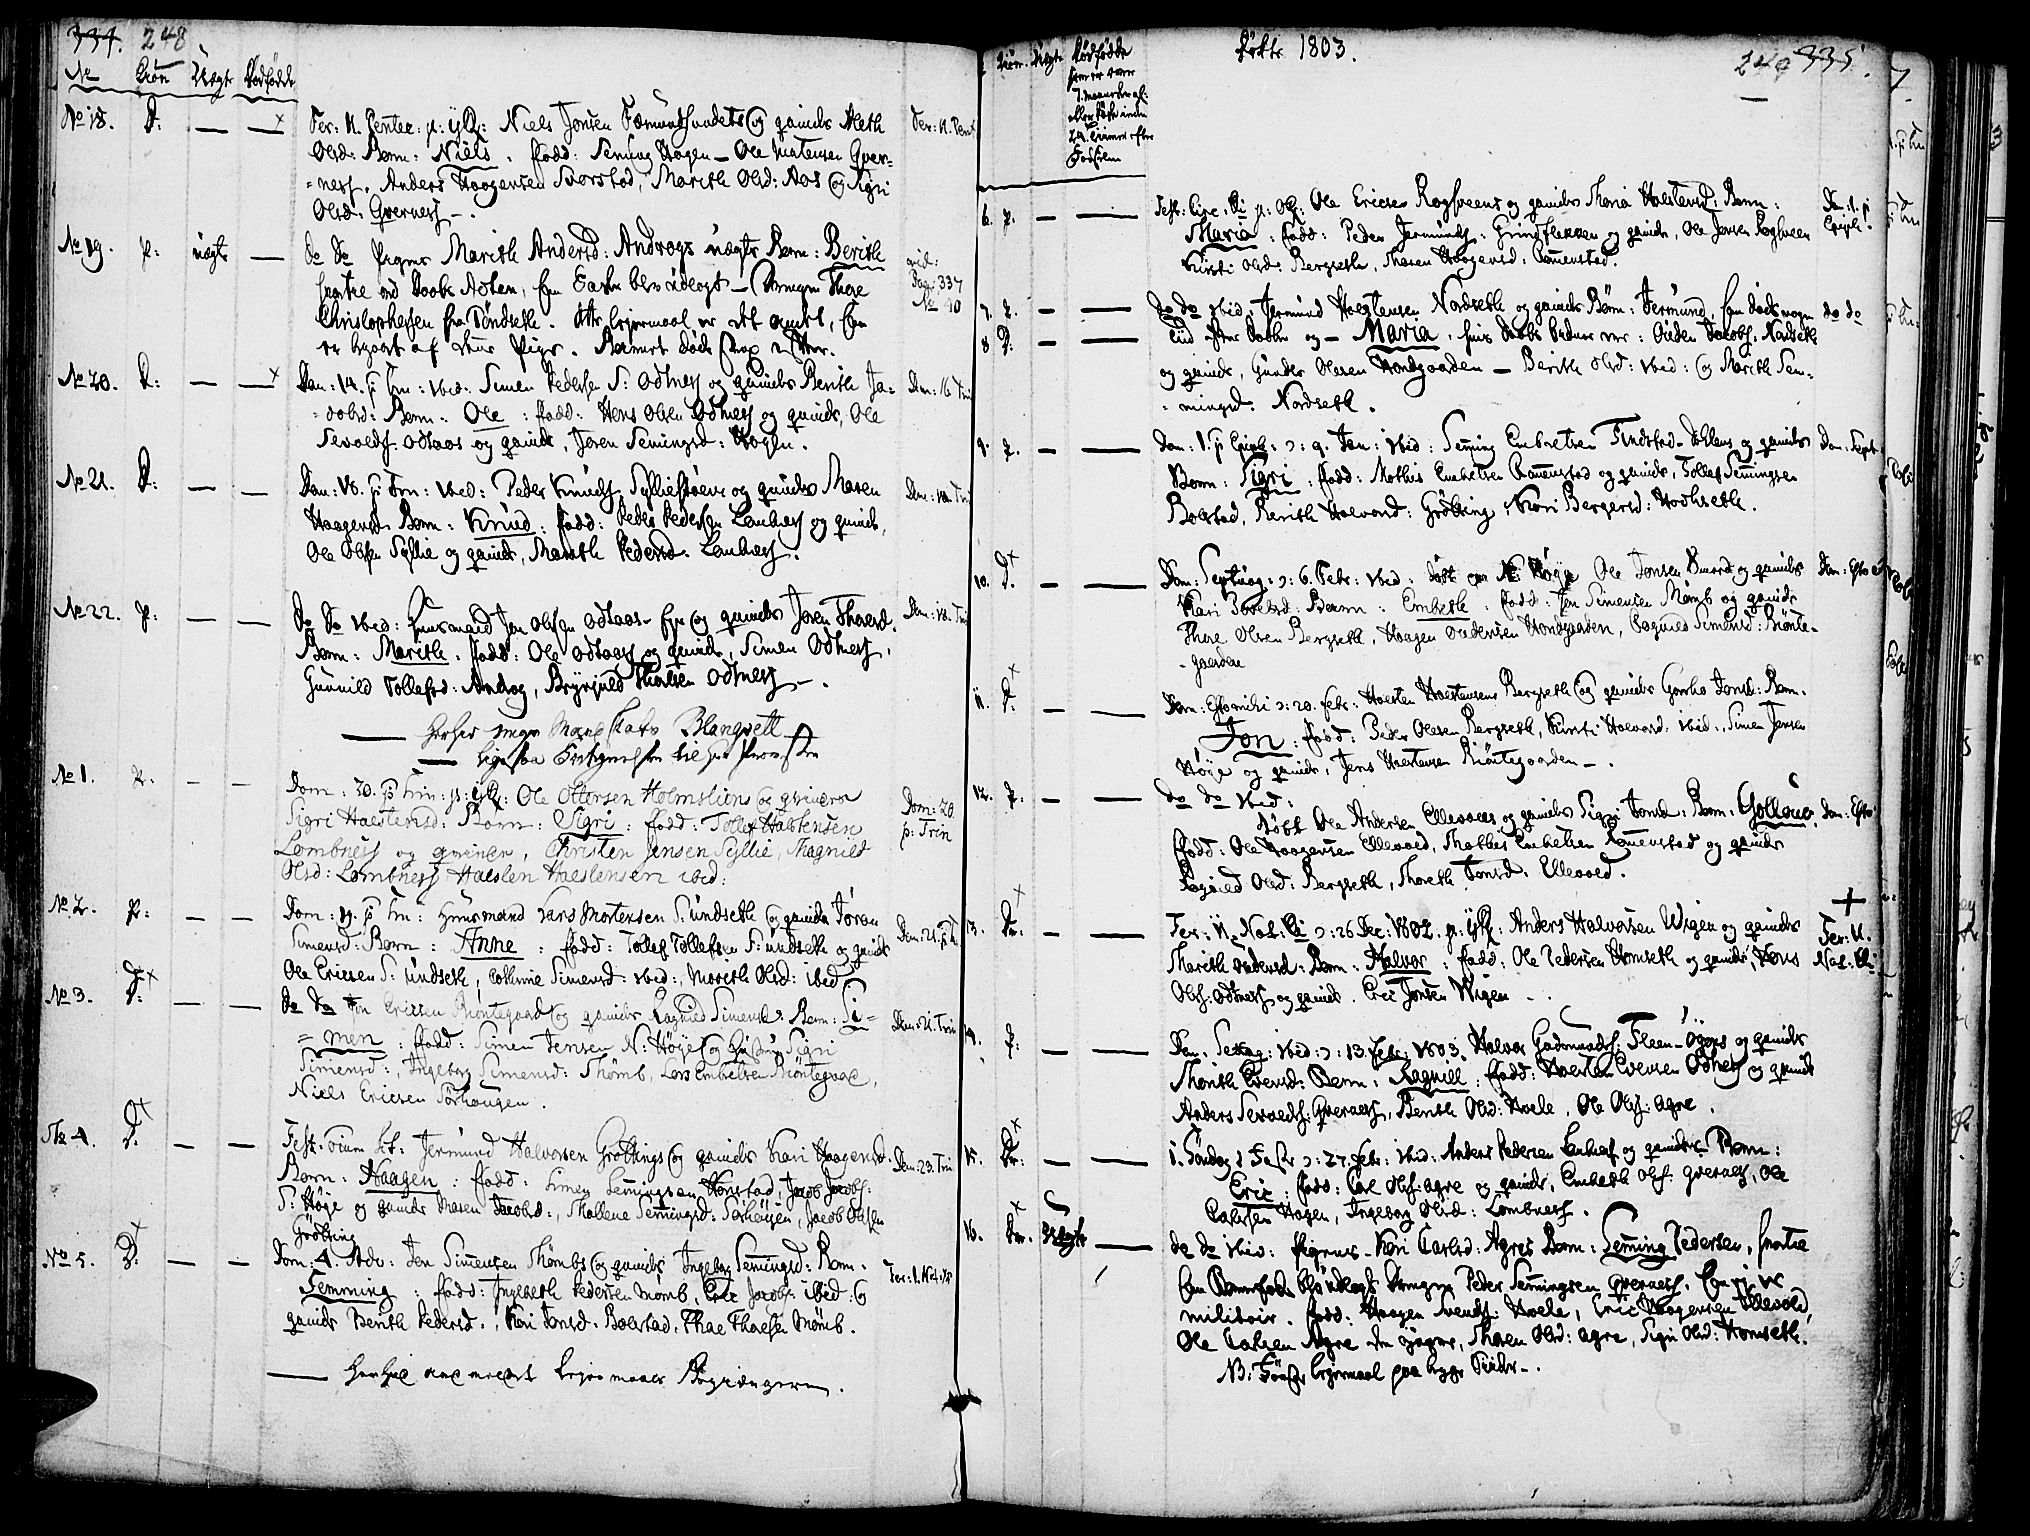 SAH, Rendalen prestekontor, H/Ha/Haa/L0002: Ministerialbok nr. 2, 1788-1814, s. 248-249